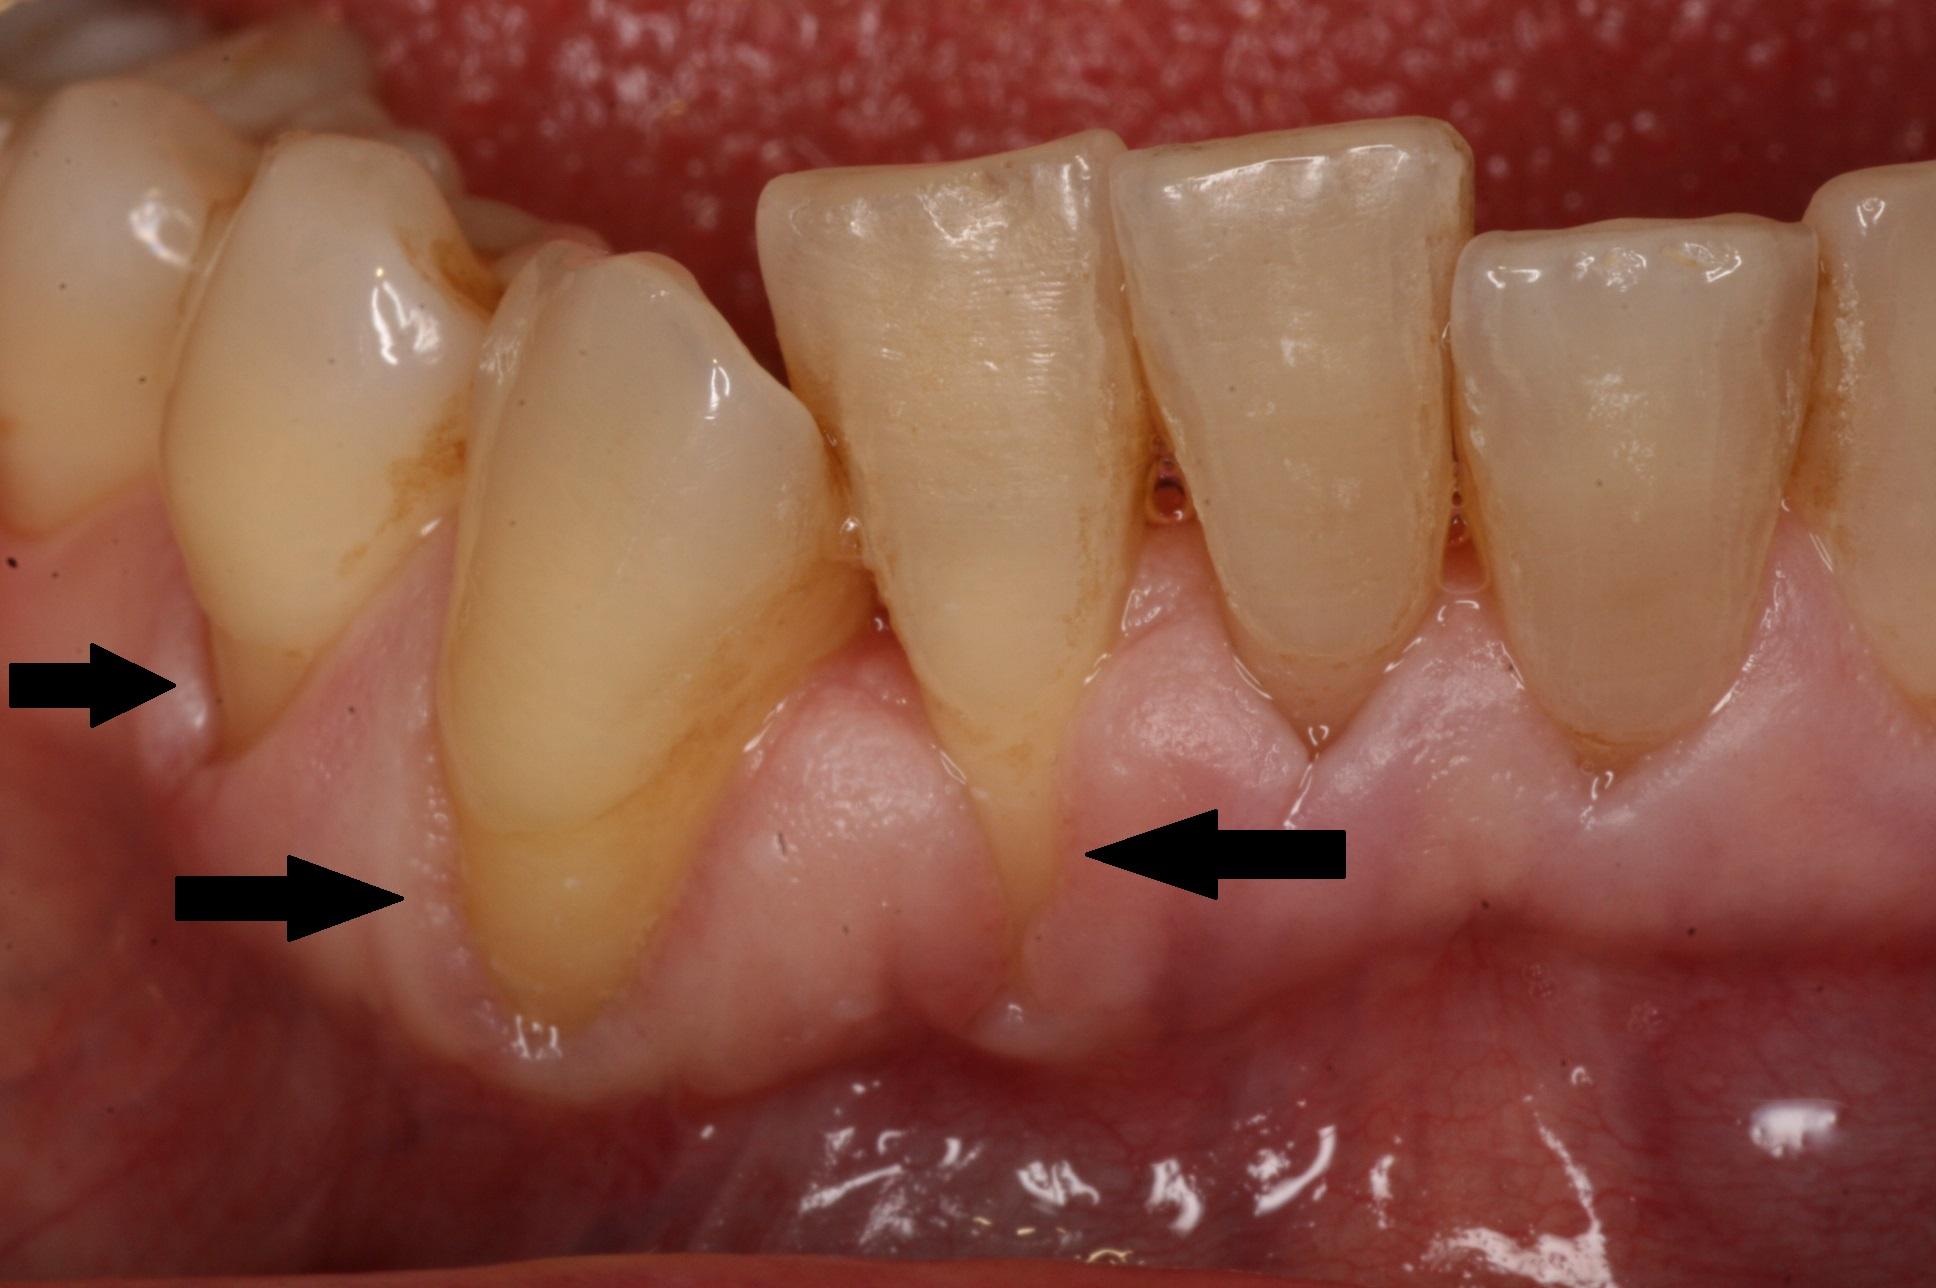 Zahnfleischrückgang was tun